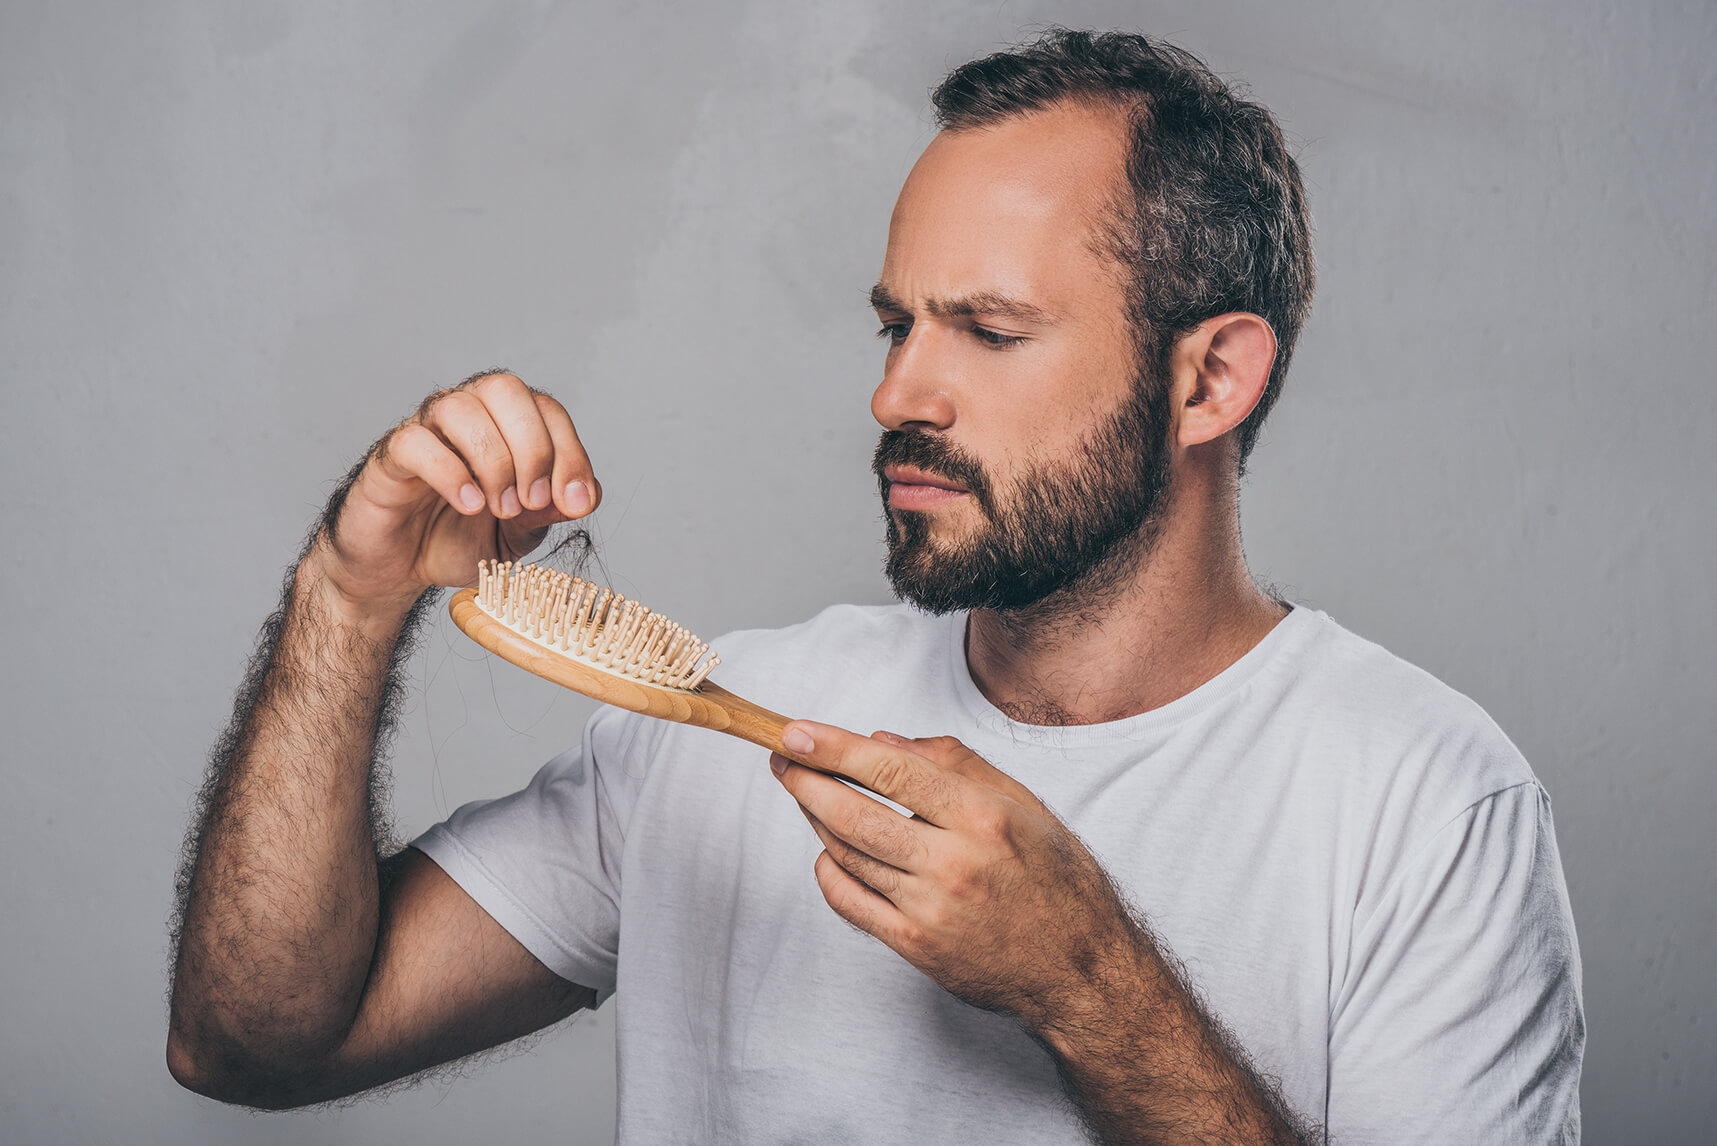 man inspecting hair left on a hairbrush